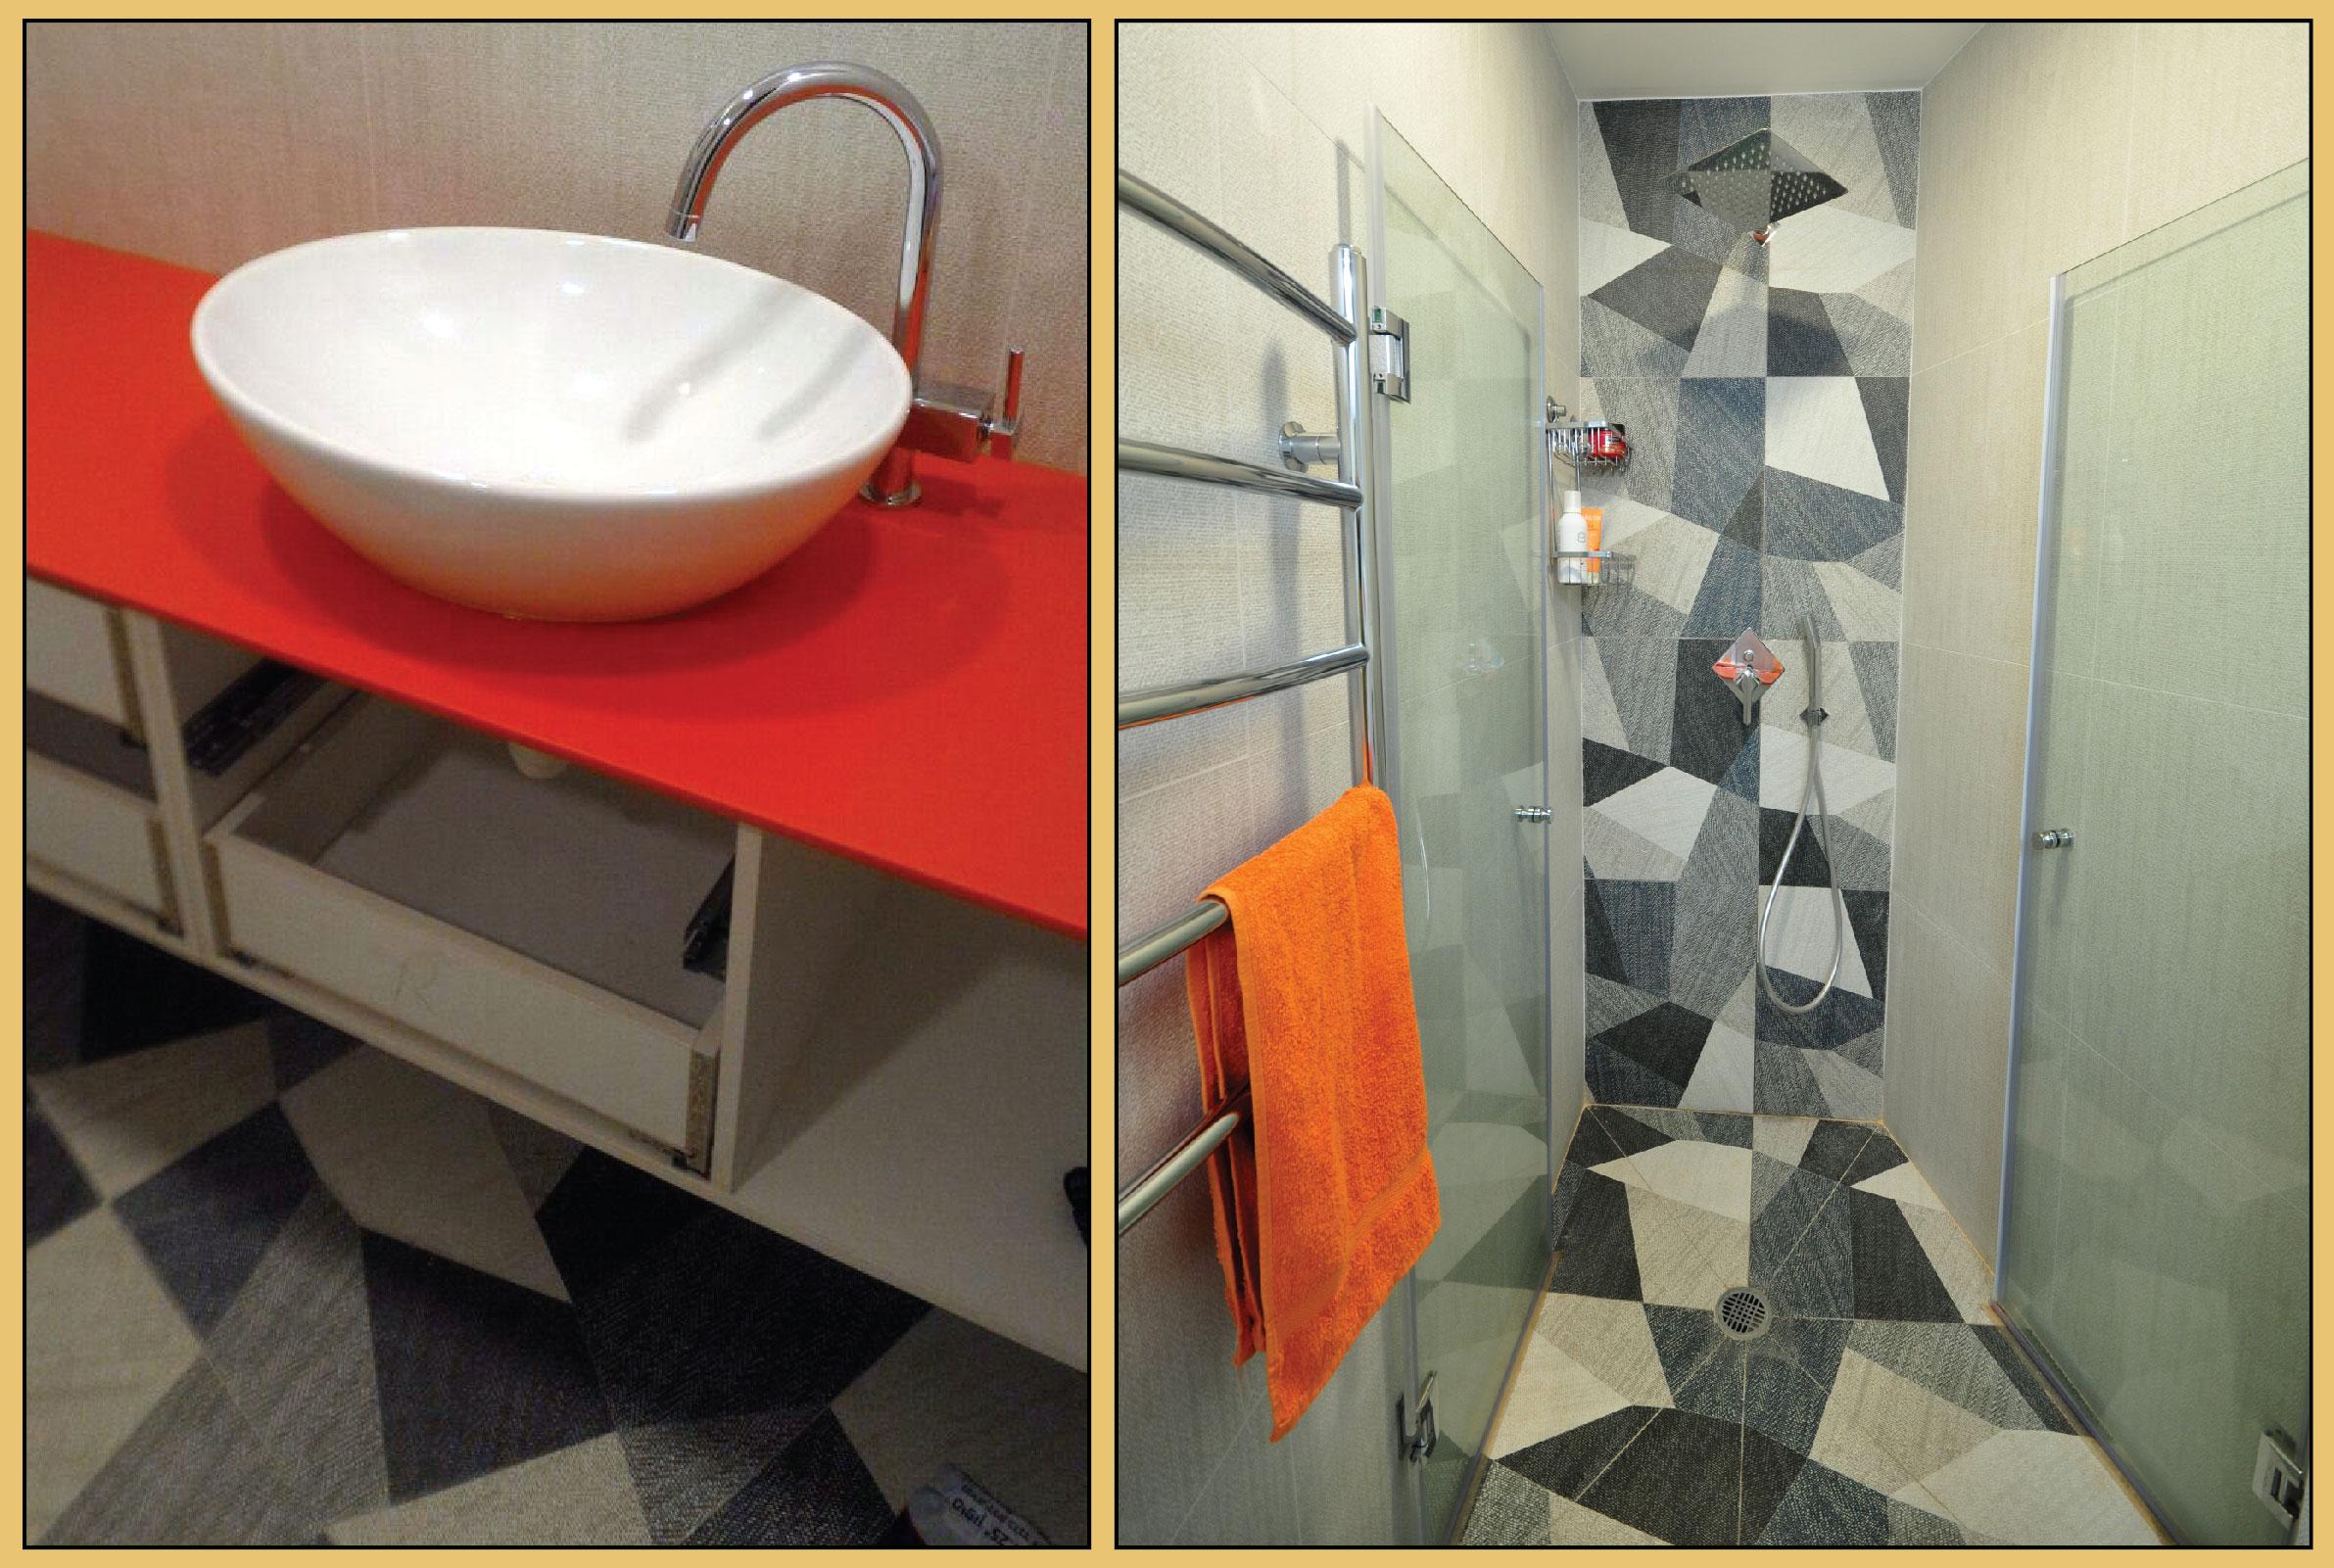 Orange Korean surface in a bathroom